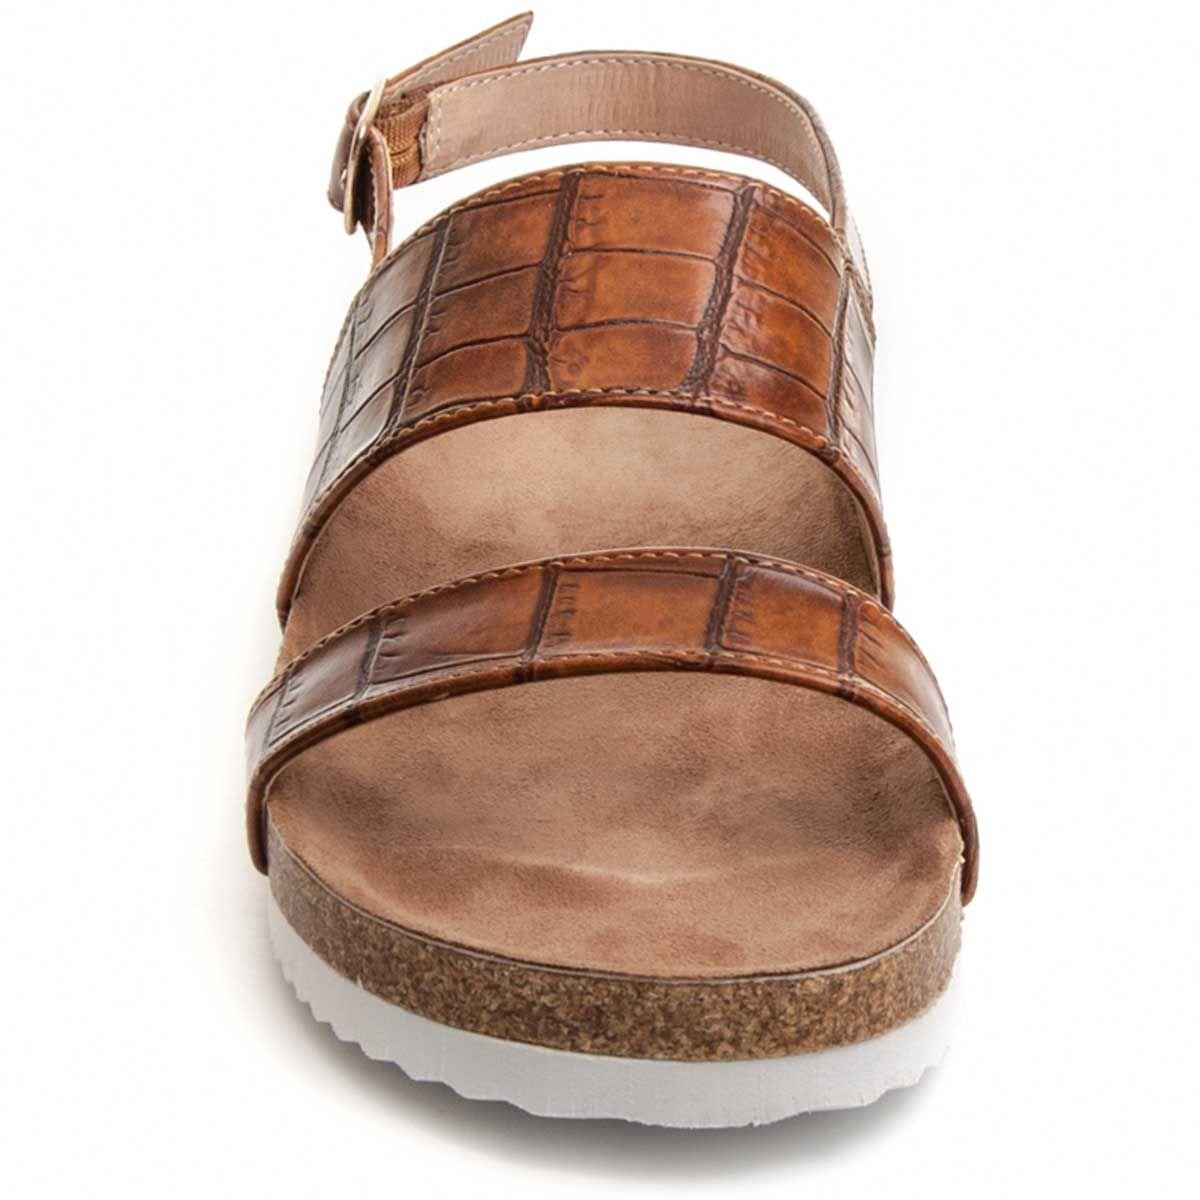 Montevita Double Strap Flat Sandal in Camel